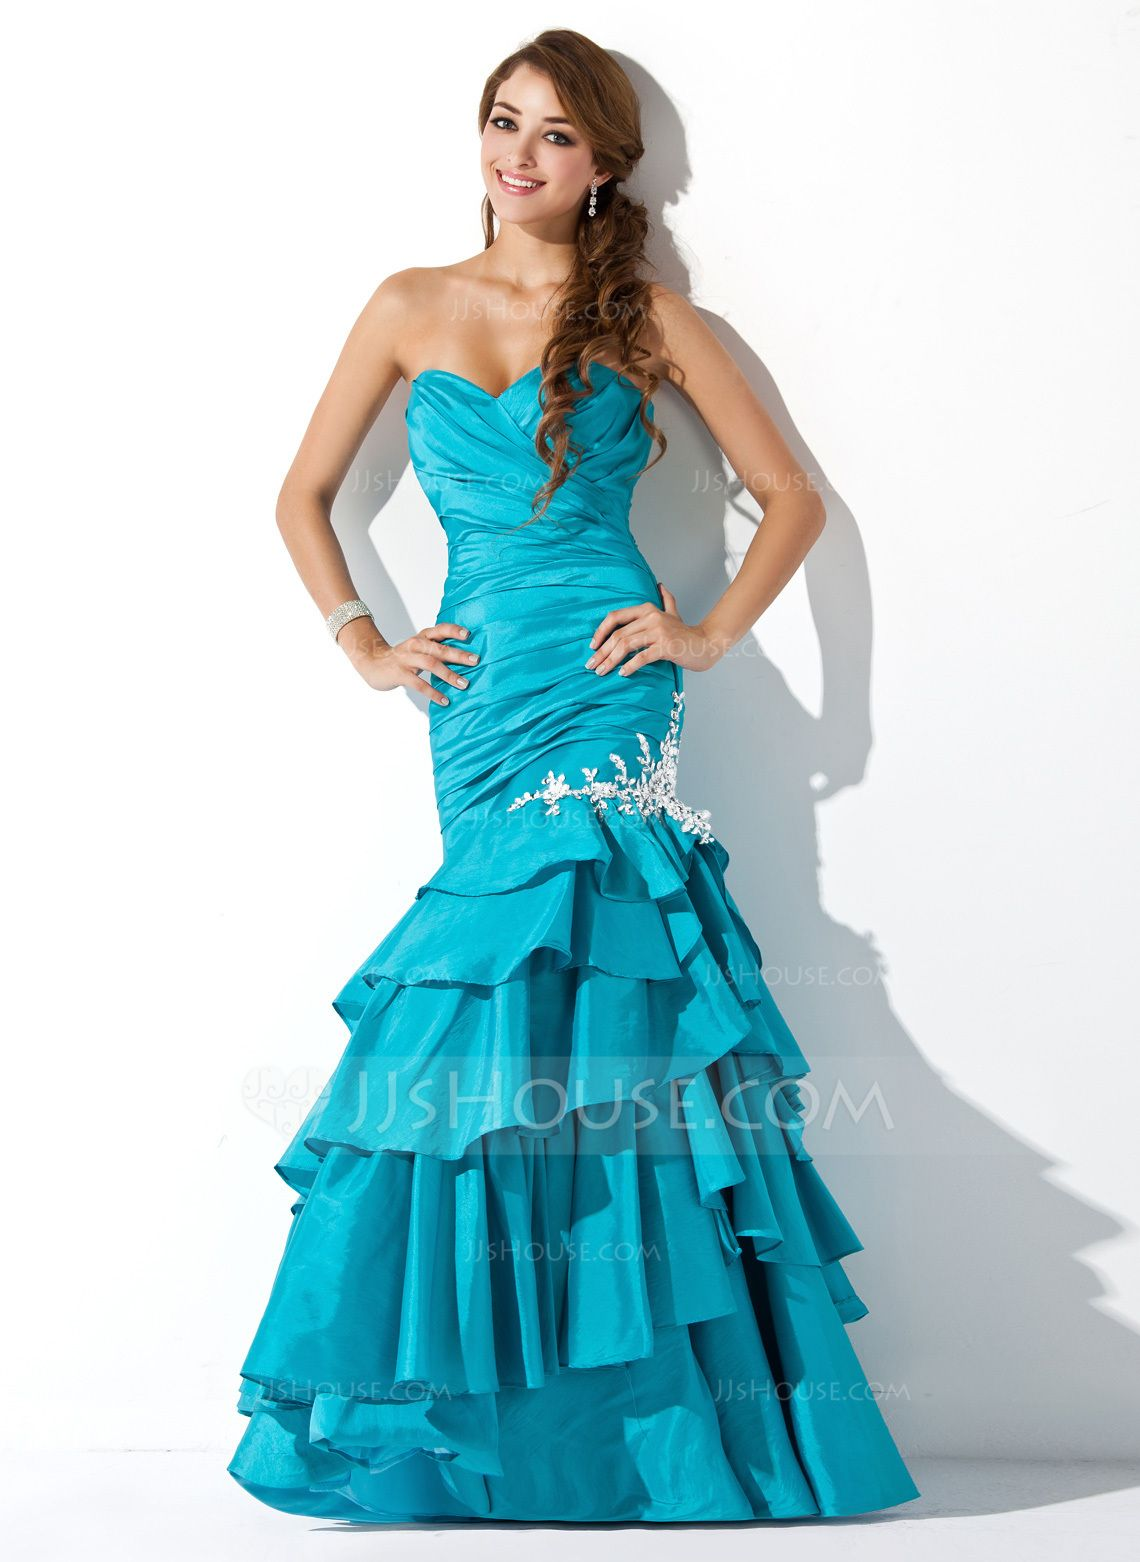 Turquiose Mermaid JJ\'s House prom dress | Dresses | Pinterest ...